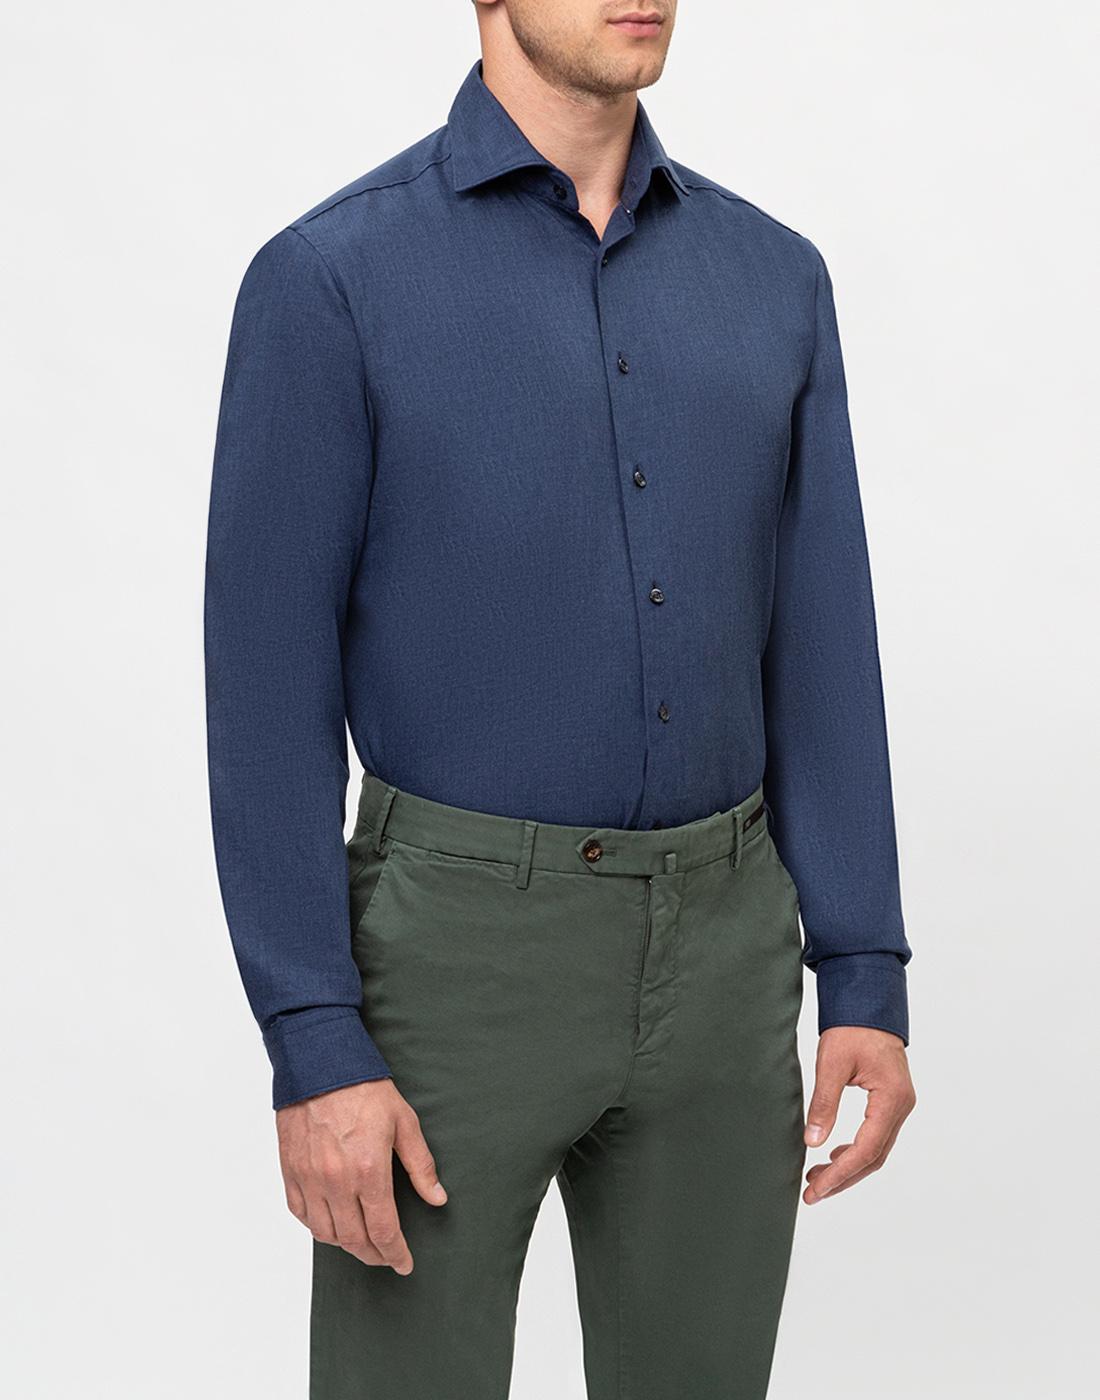 Мужская темно-синяя рубашка Van Laack S155026/780-3